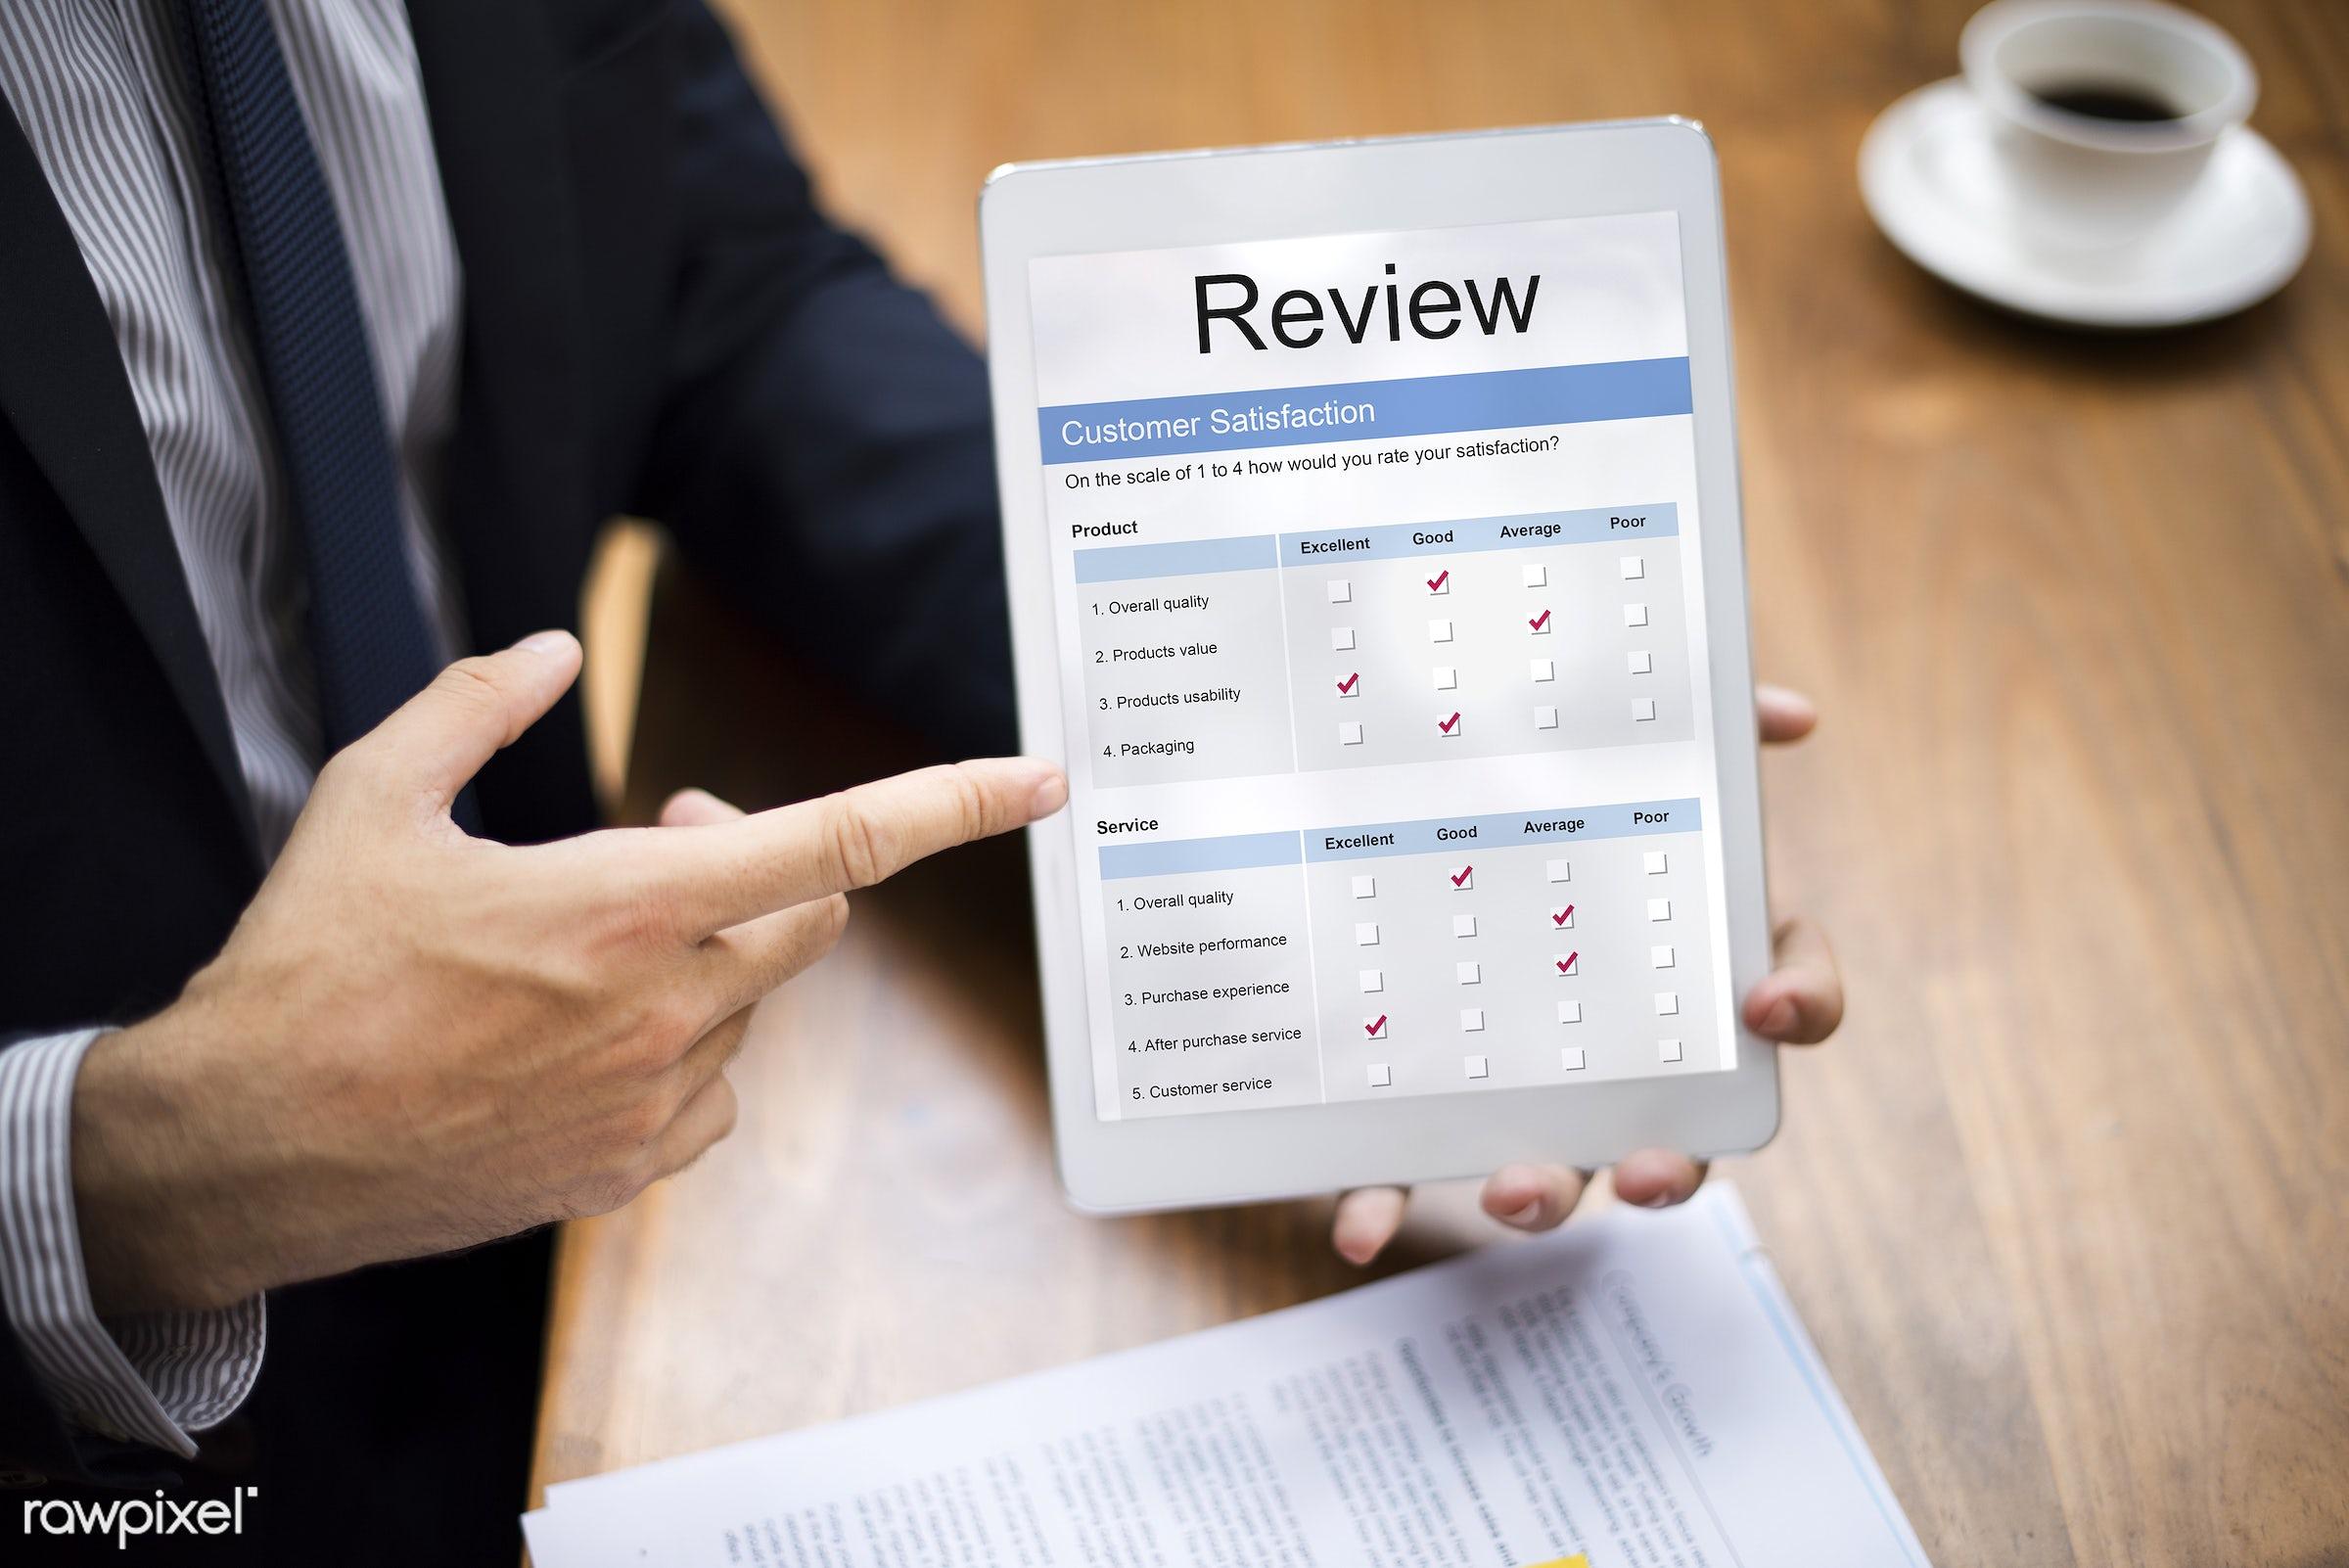 review, feedback, analysis, asian, assessment, business, businessmen, businesswomen, care, comment, customer, customer care...